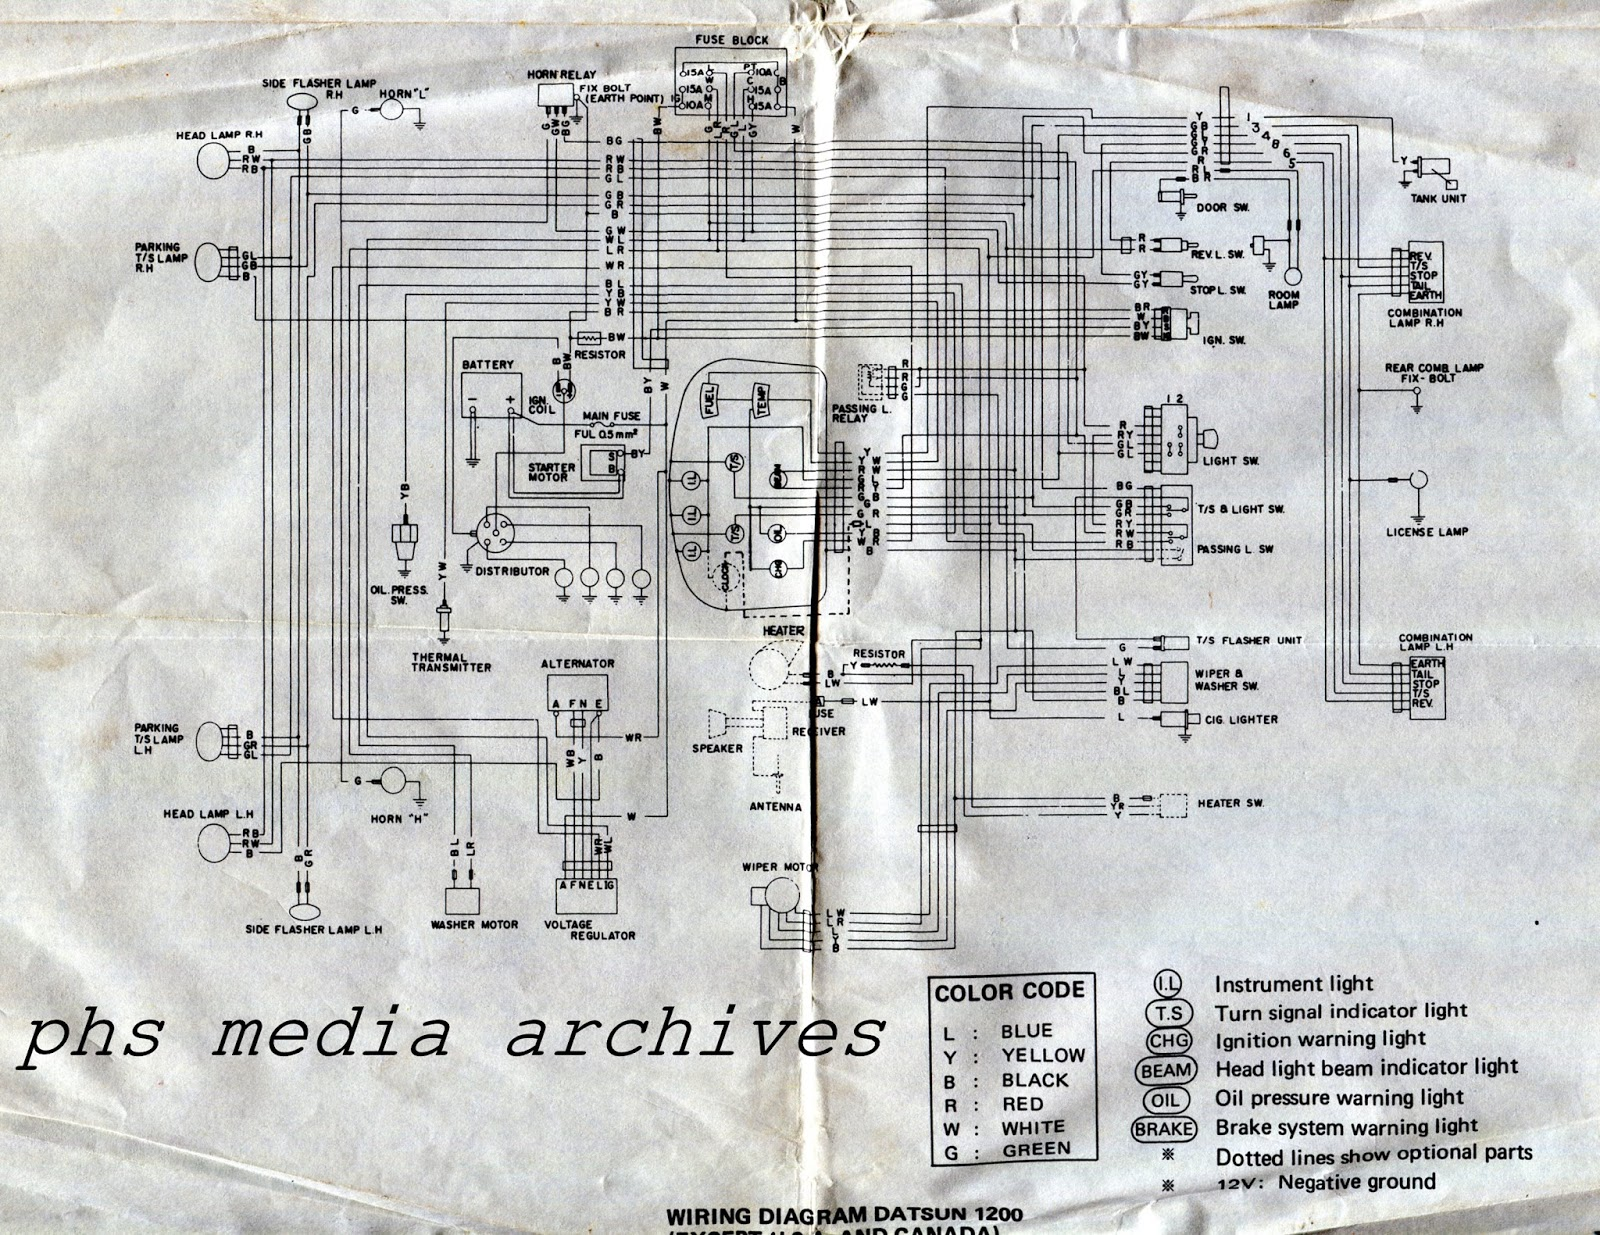 phs tech series 1971 72 datsun 1200 wiring diagrams 3 way switch light wiring diagram [ 1600 x 1235 Pixel ]